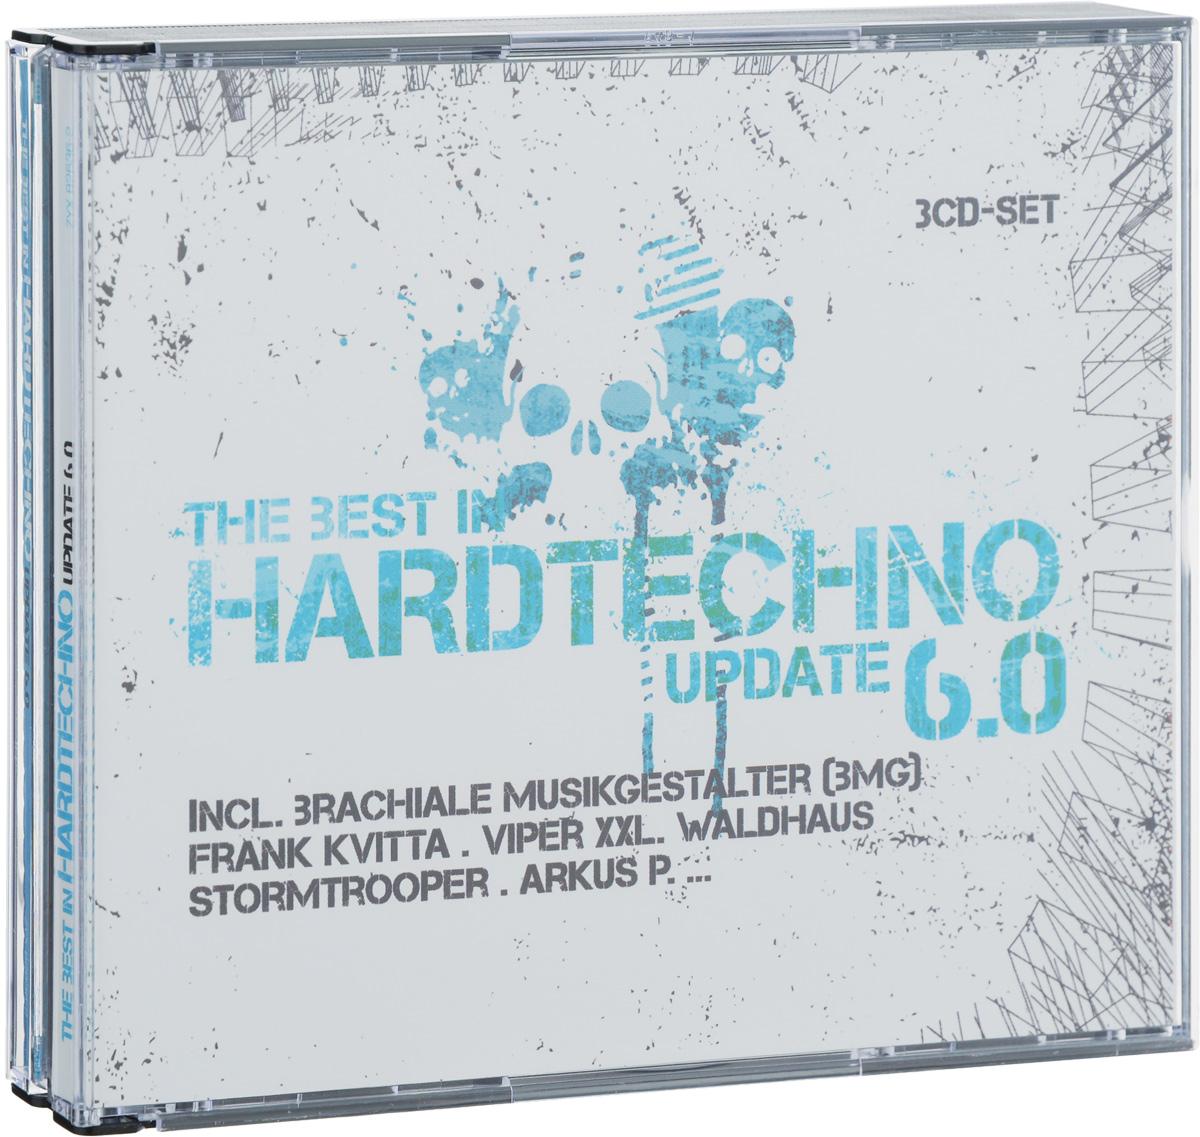 The Best In Hardtechno. Update 6.0 (3 CD) 2013 3 Audio CD